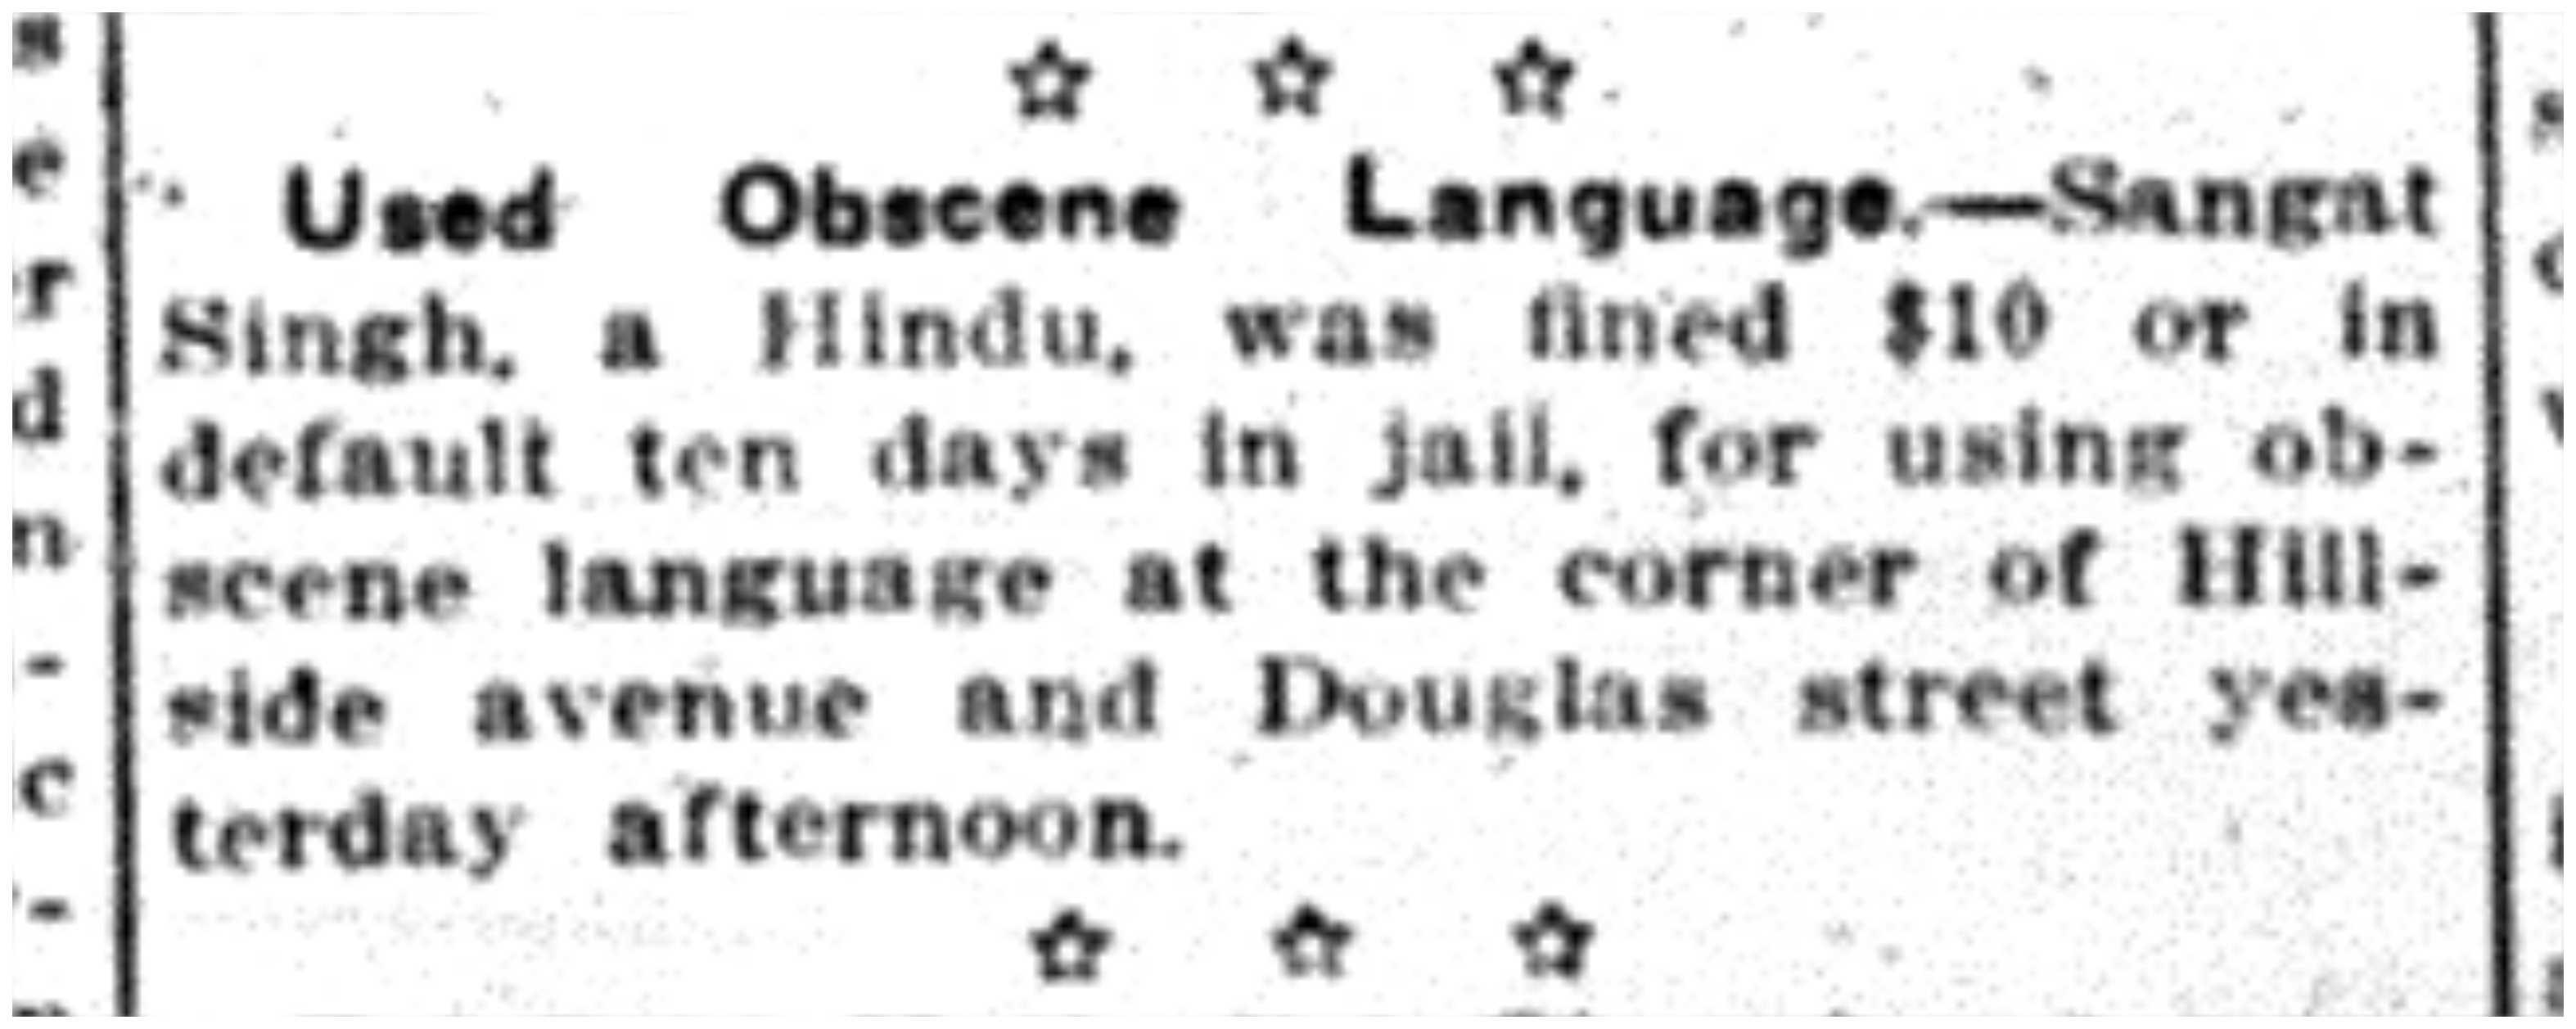 Unusual Crime Report